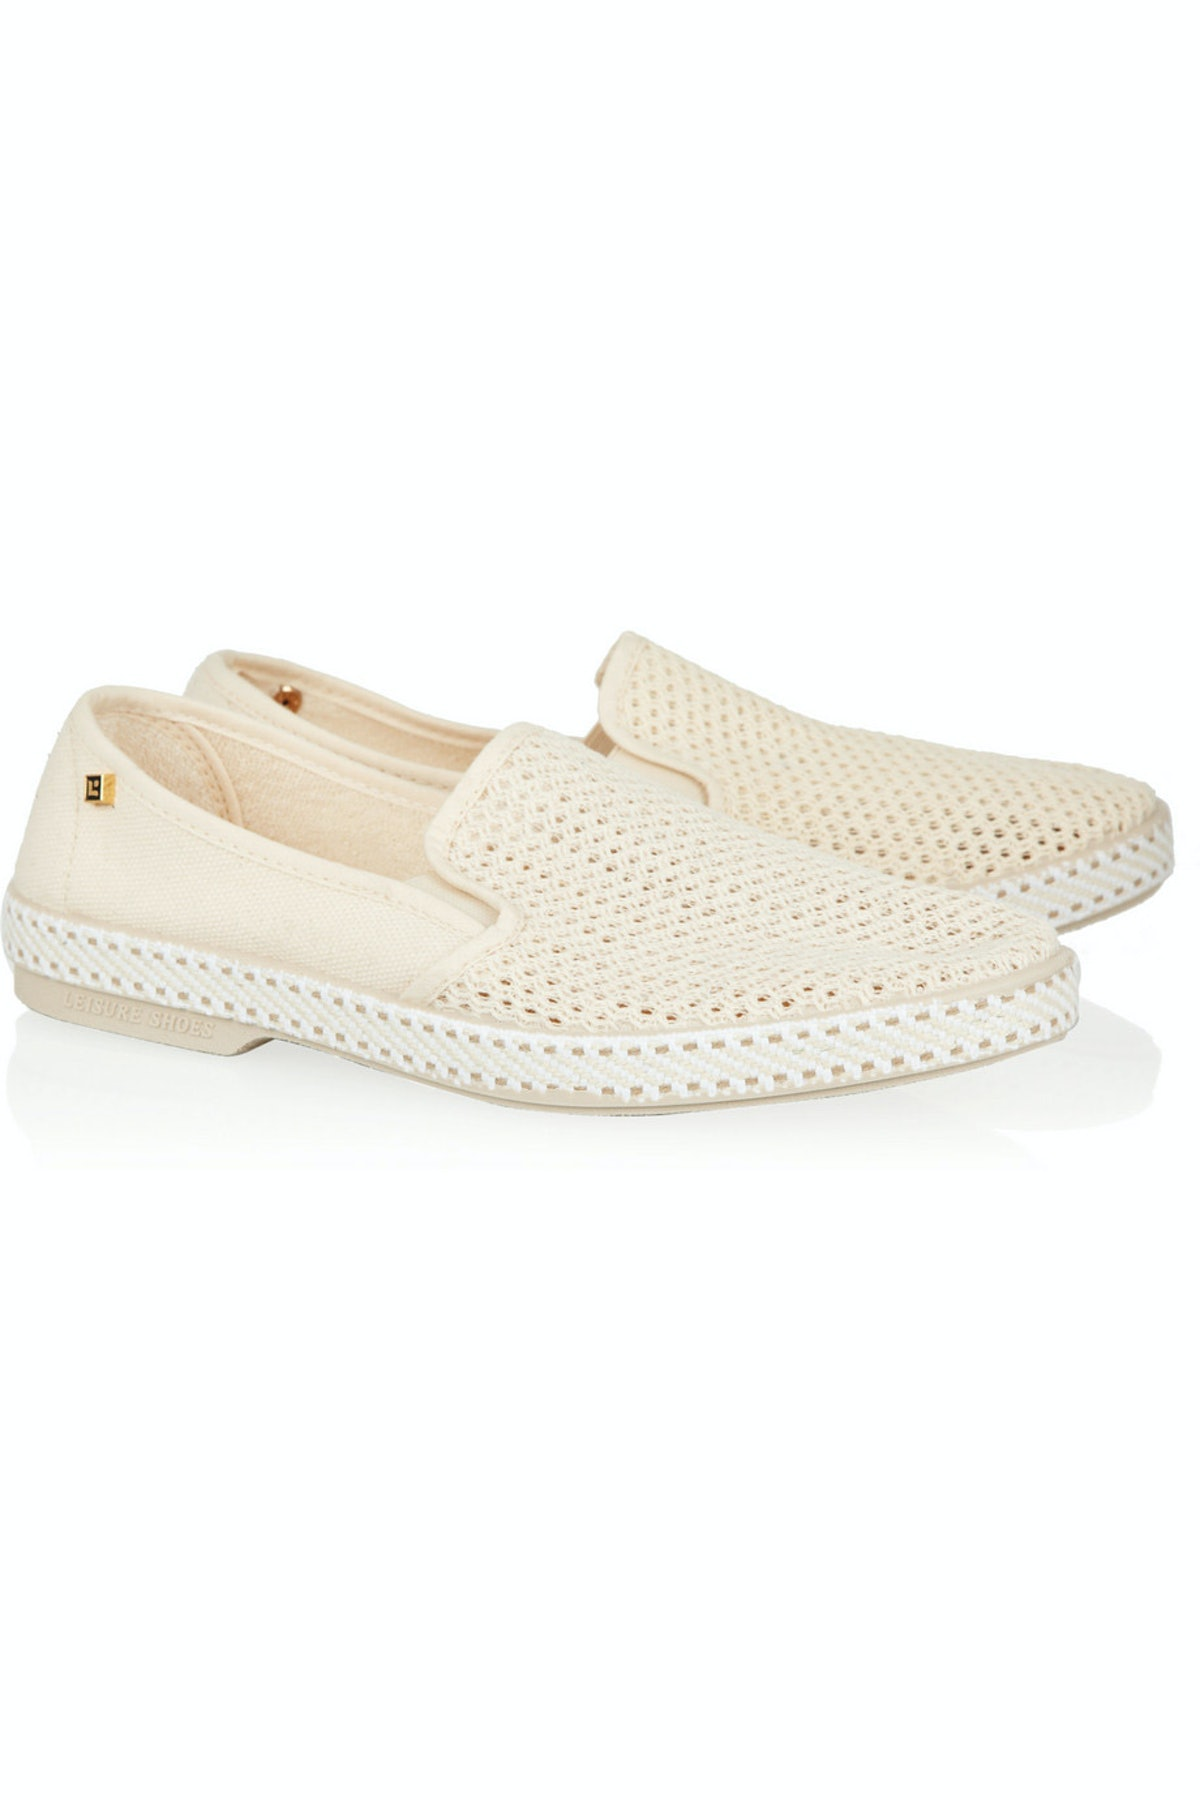 acar-RIVIERAS-canvas-slip-on-shoes